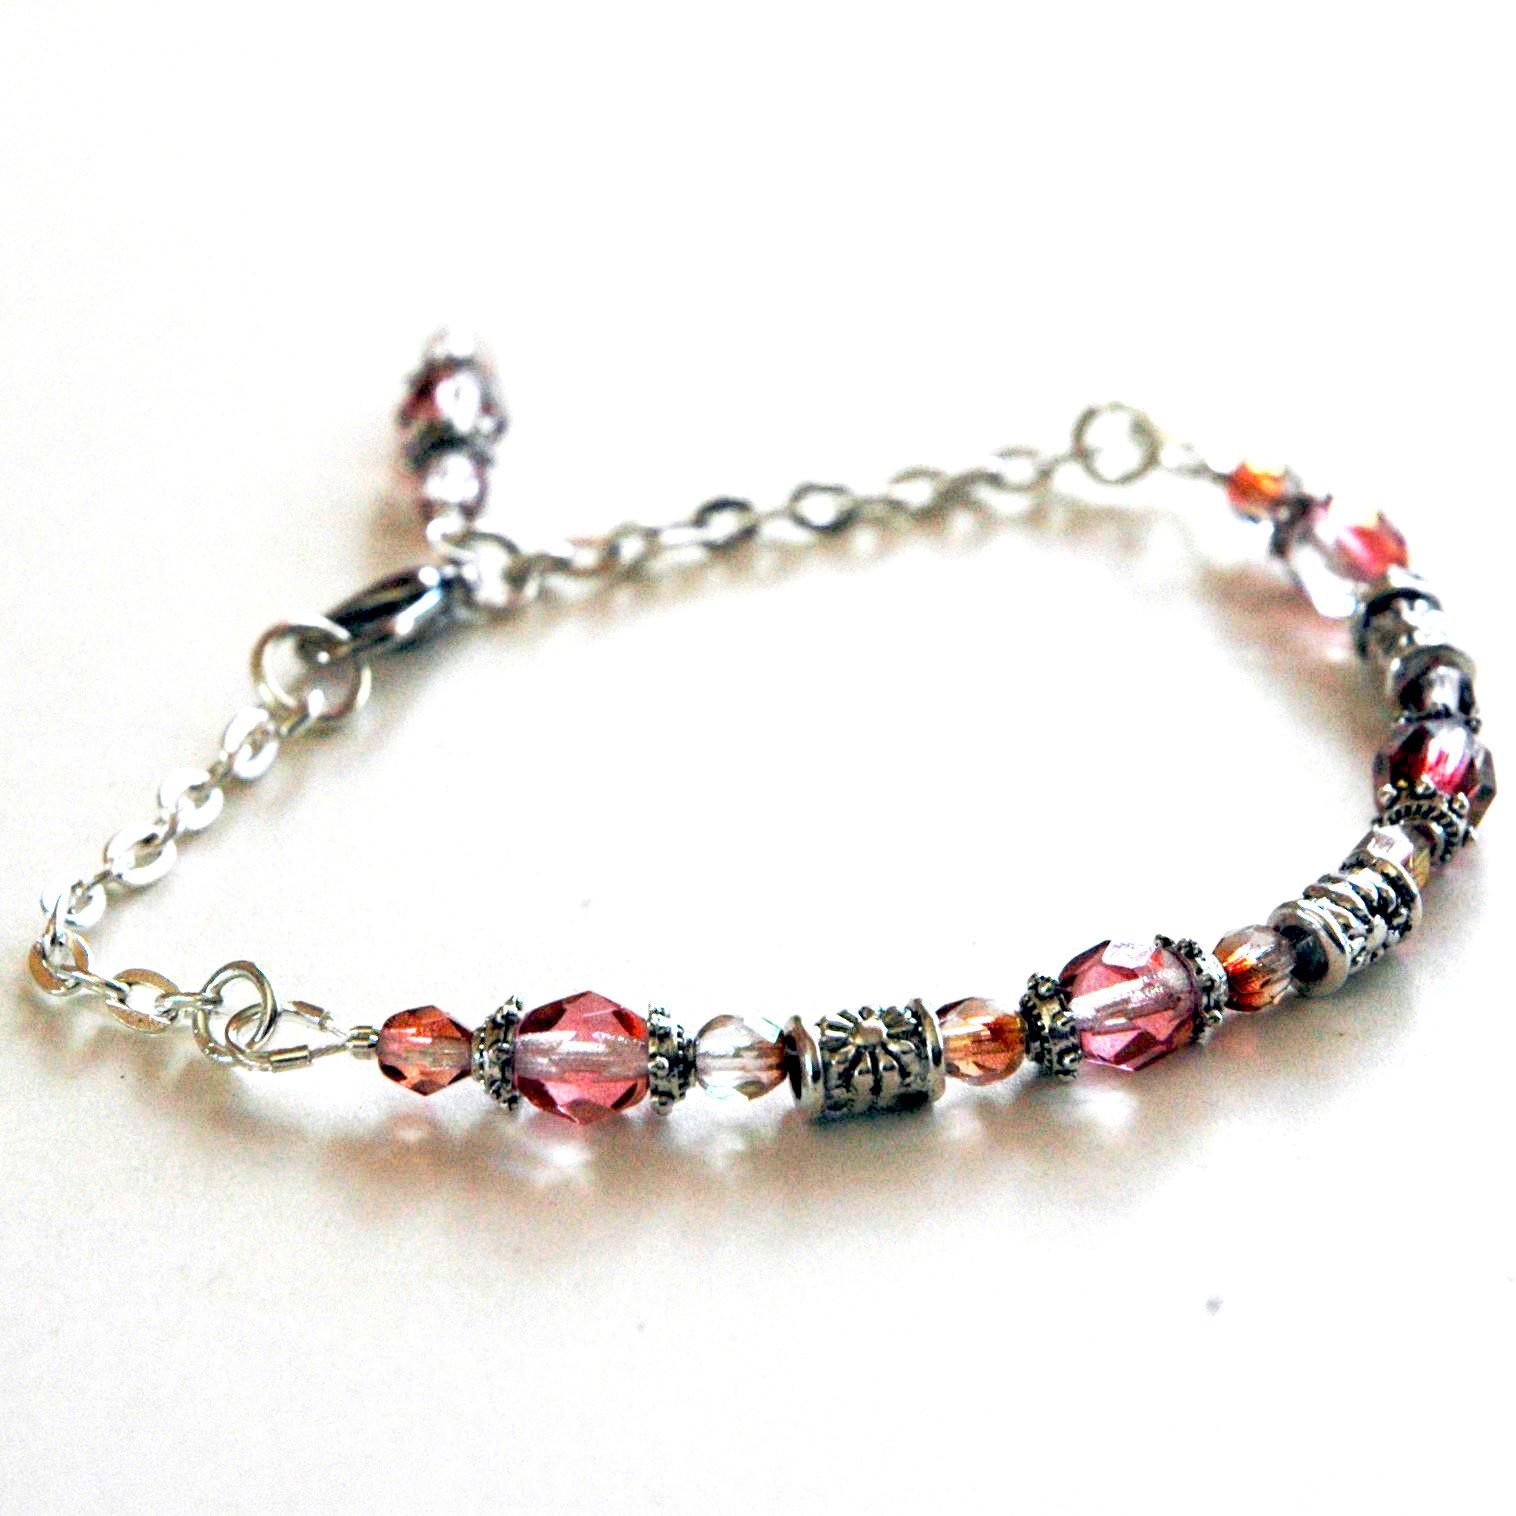 Bohemian Charm Bracelet/Anklet